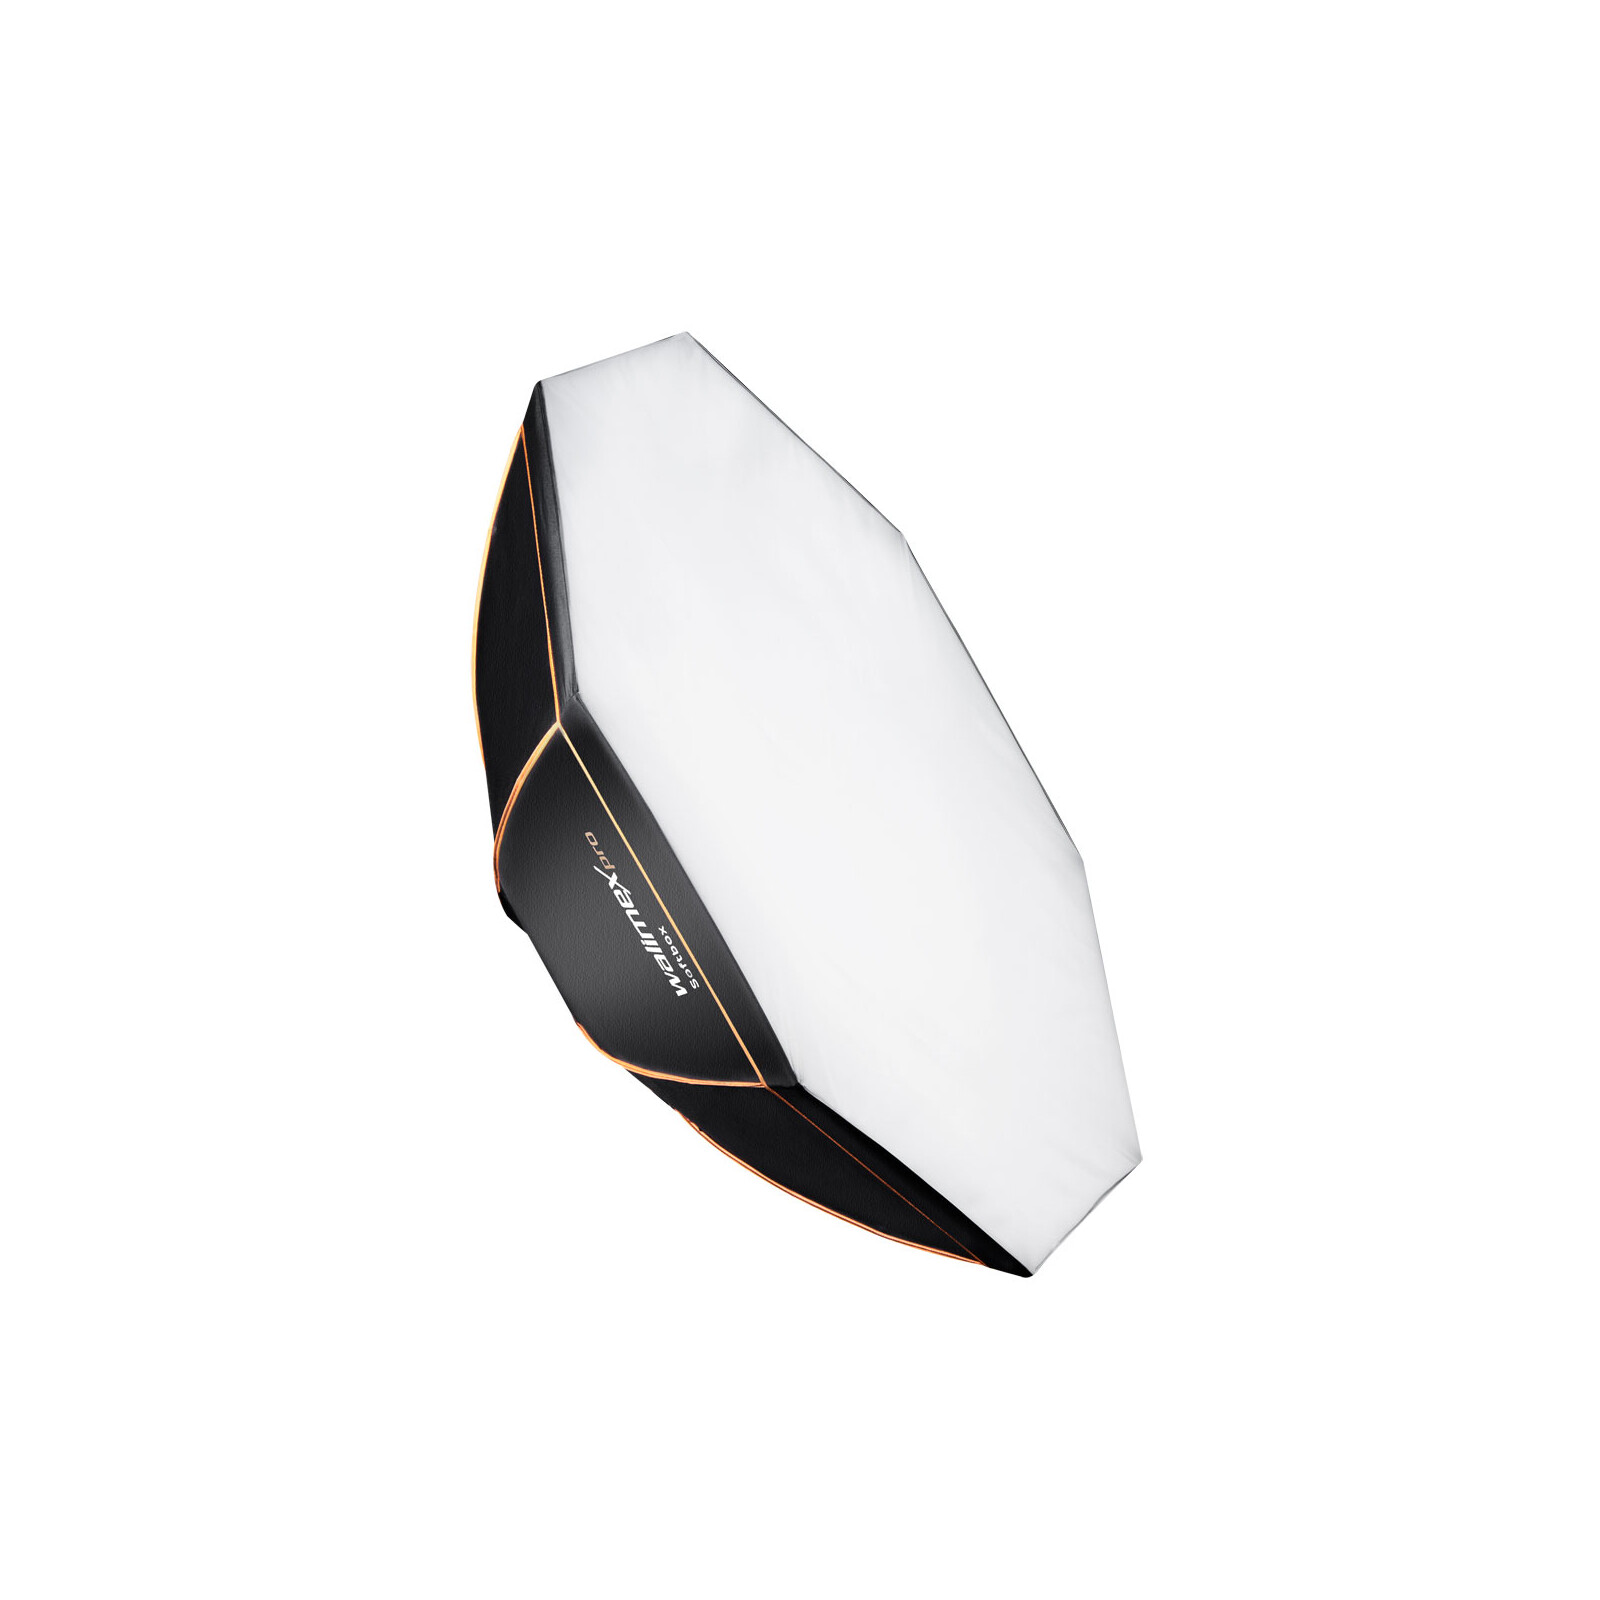 walimex pro Octagon Softbox OL Ø120 Electra Small